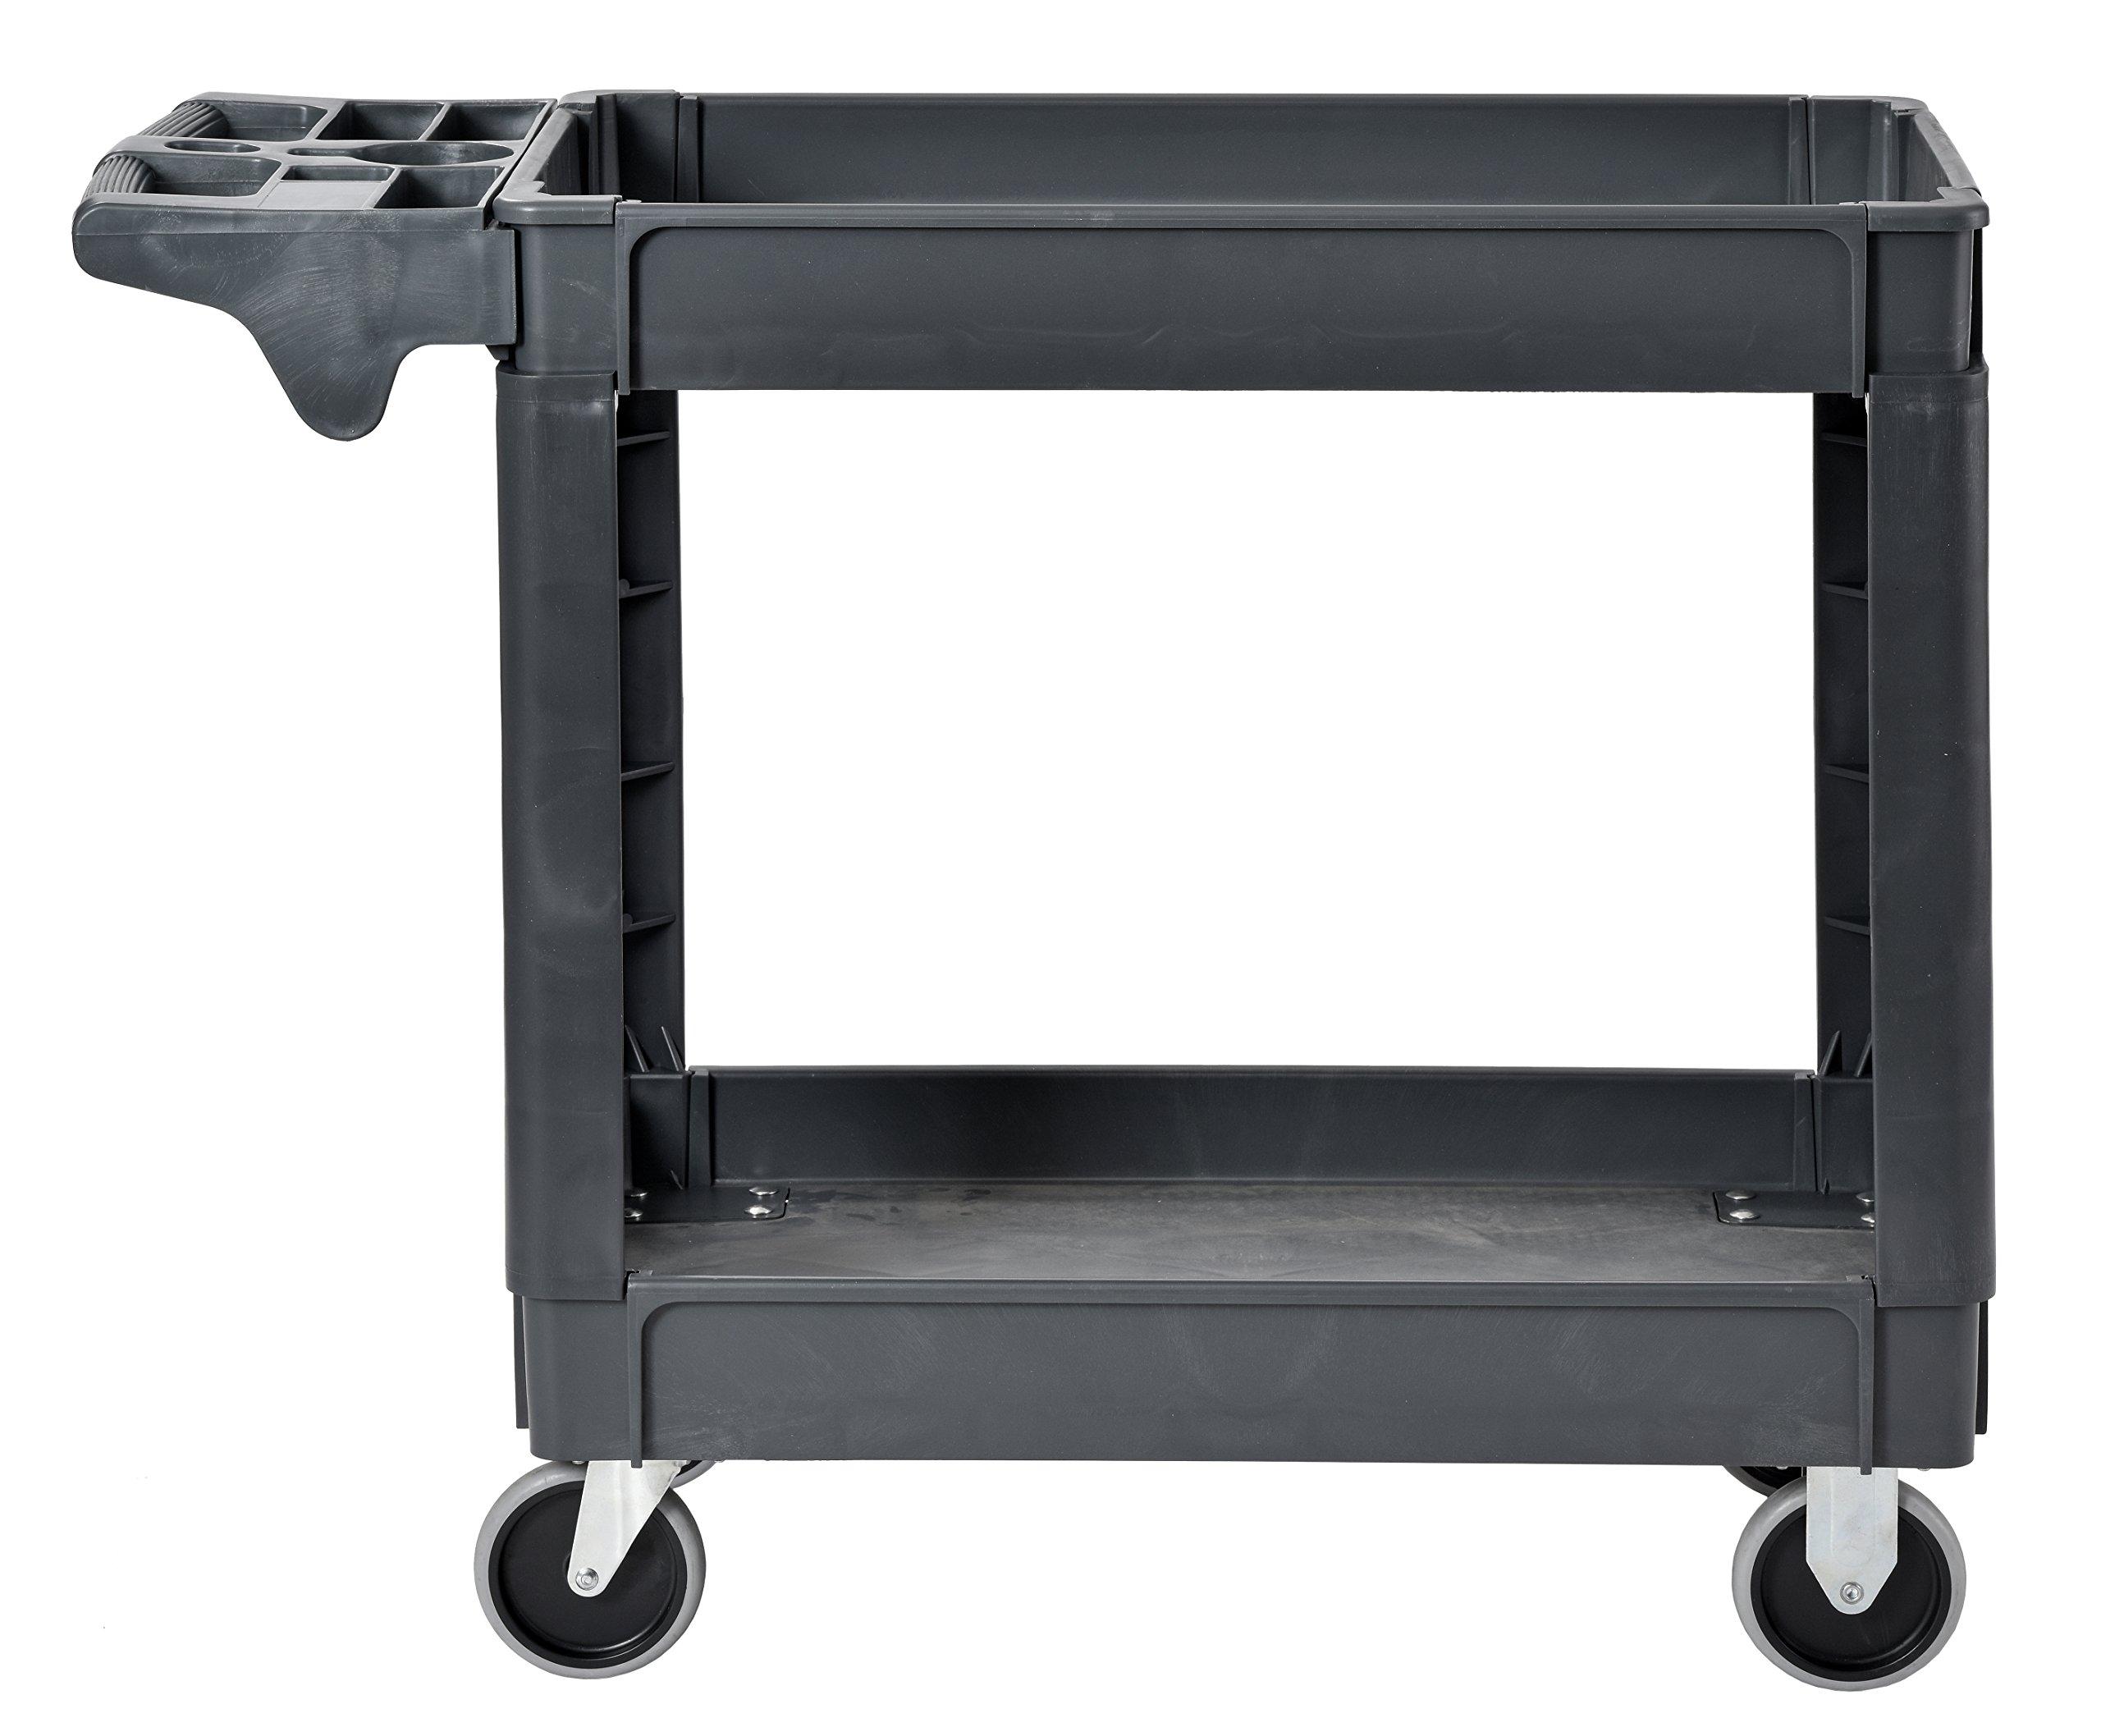 Sandusky Lee PUC174033-2 Heavy-Duty Plastic Utility Cart, 2 Shelves, 33'' Width x 40'' Height x 17'' Depth, Gray by Sandusky